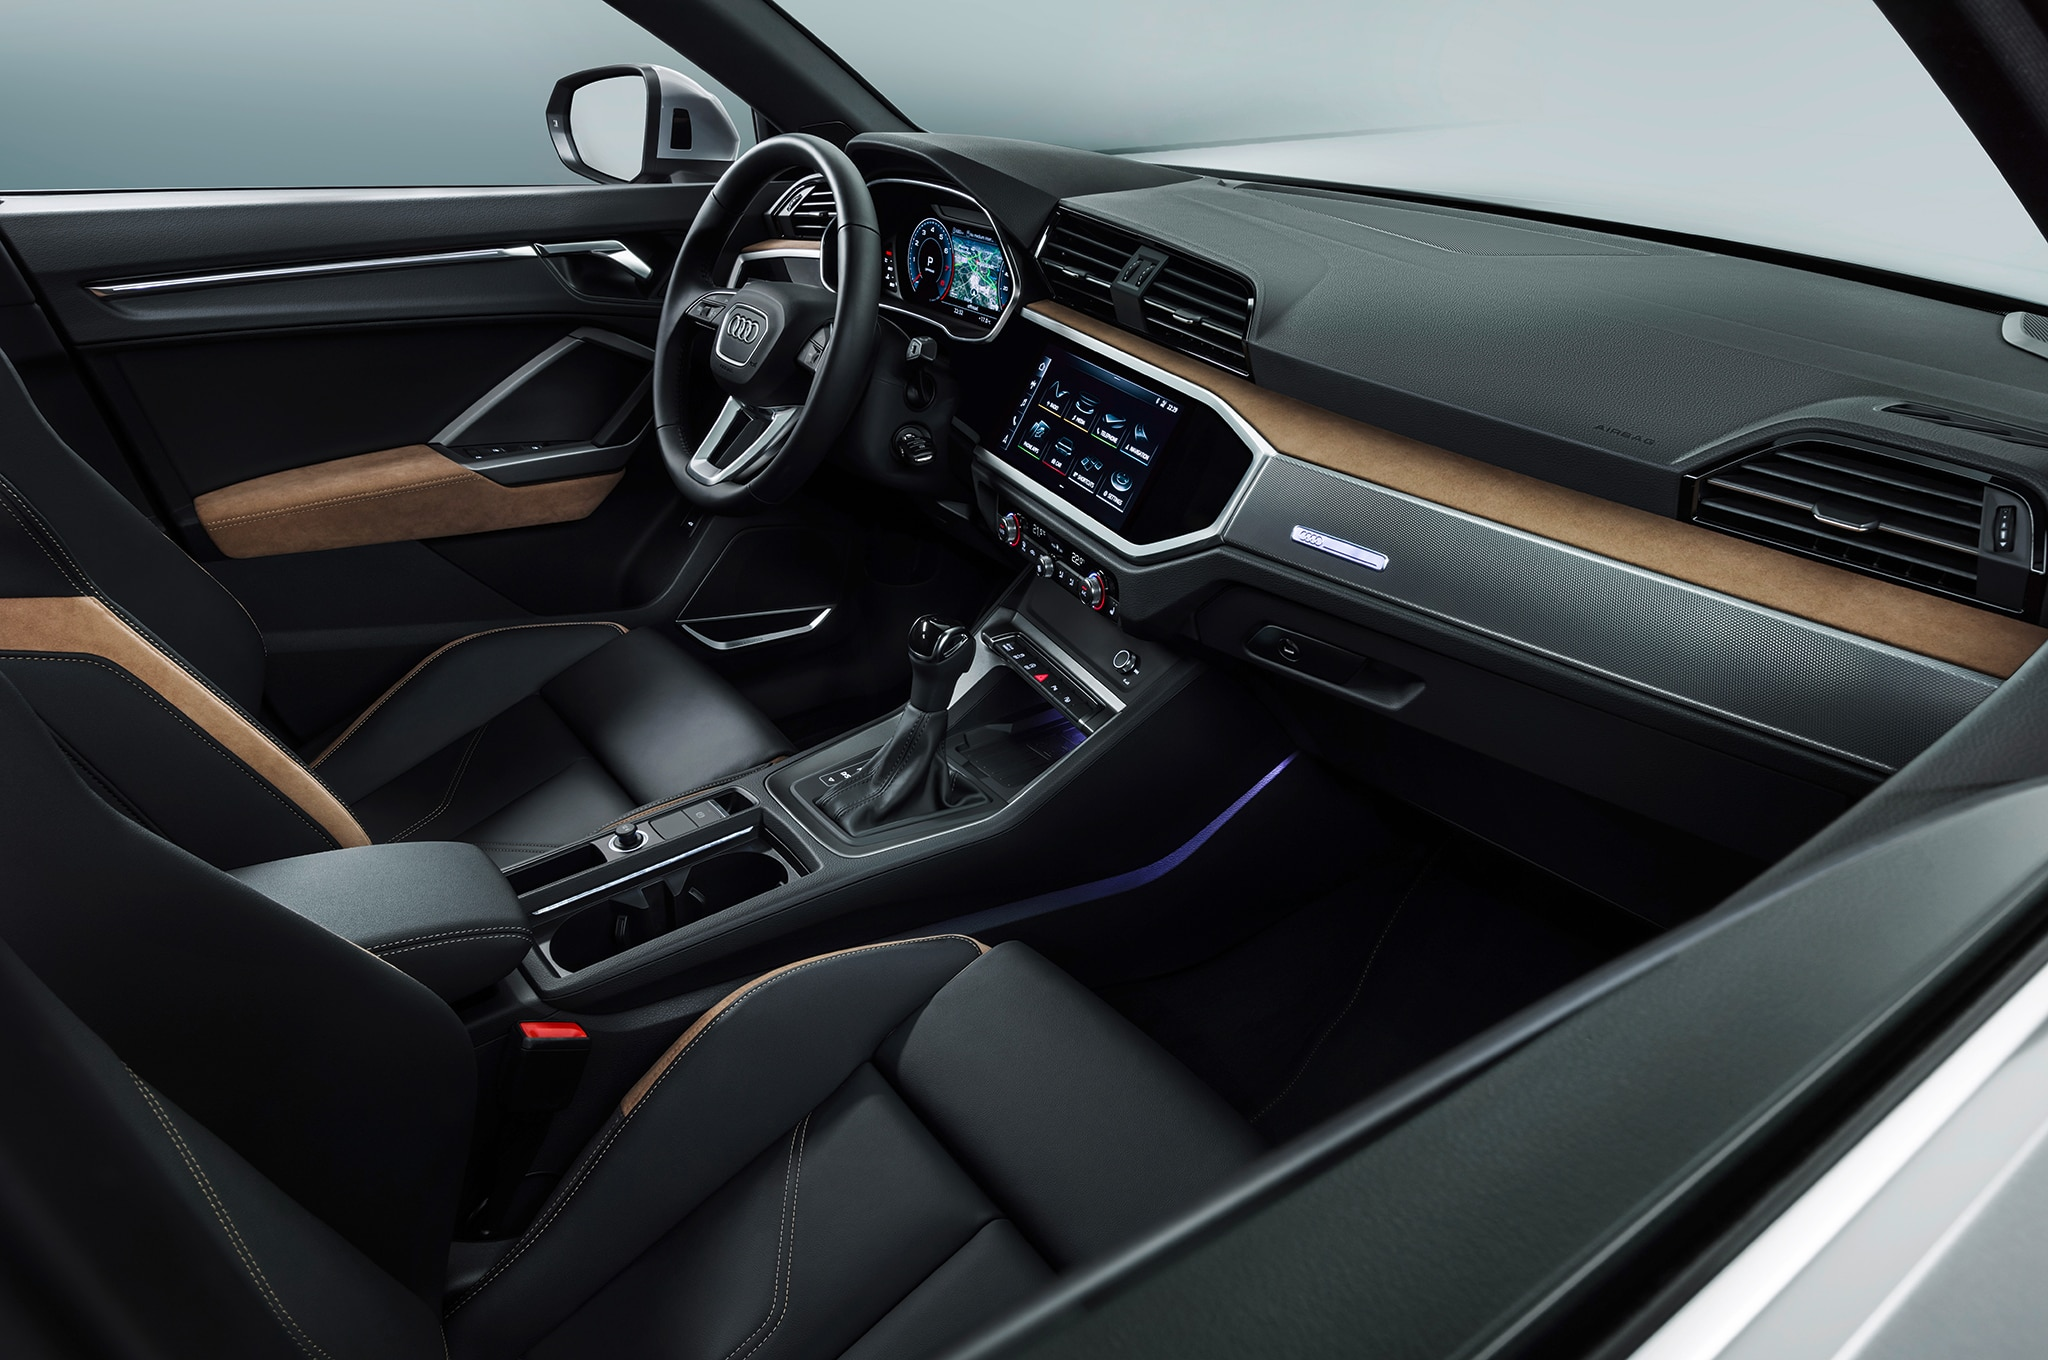 2019 audi q3 rear interior motor trend en espa ol. Black Bedroom Furniture Sets. Home Design Ideas